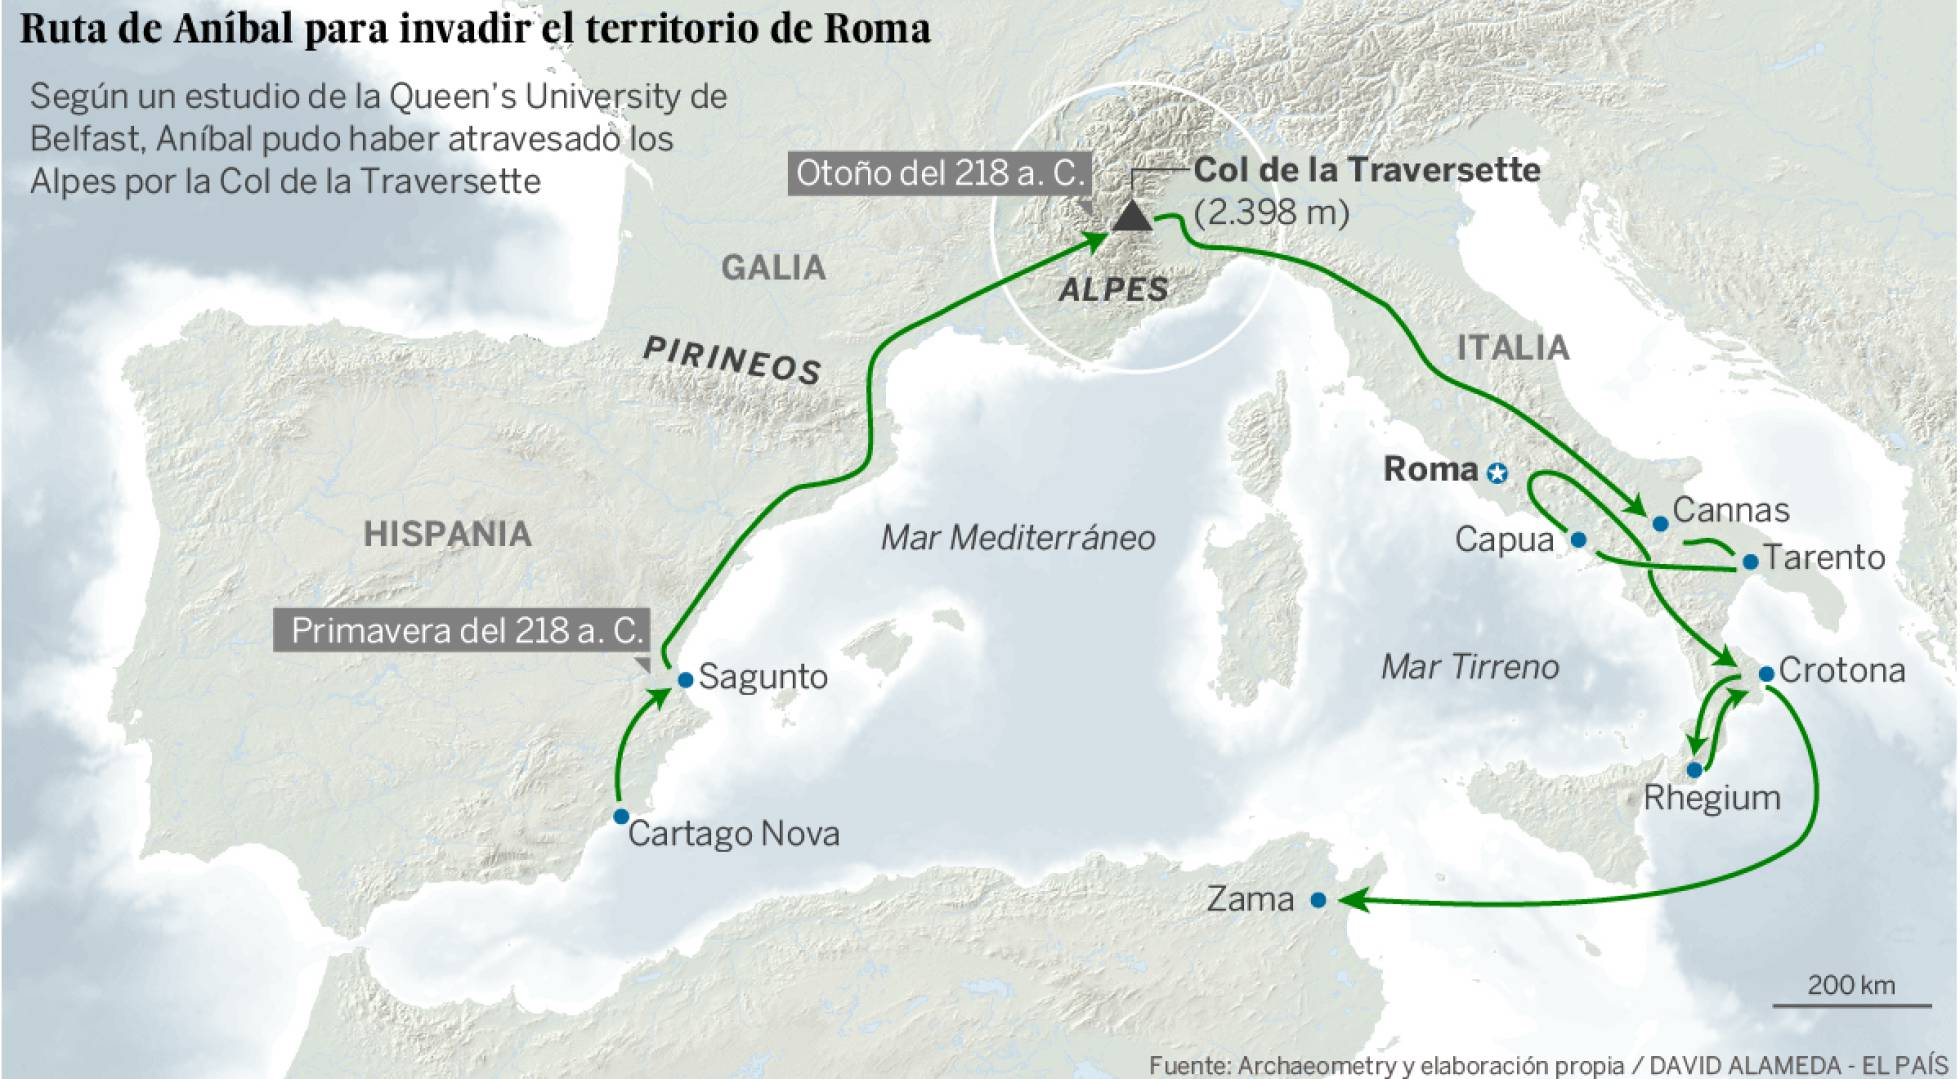 Ruta d'Aníbal fins a Roma